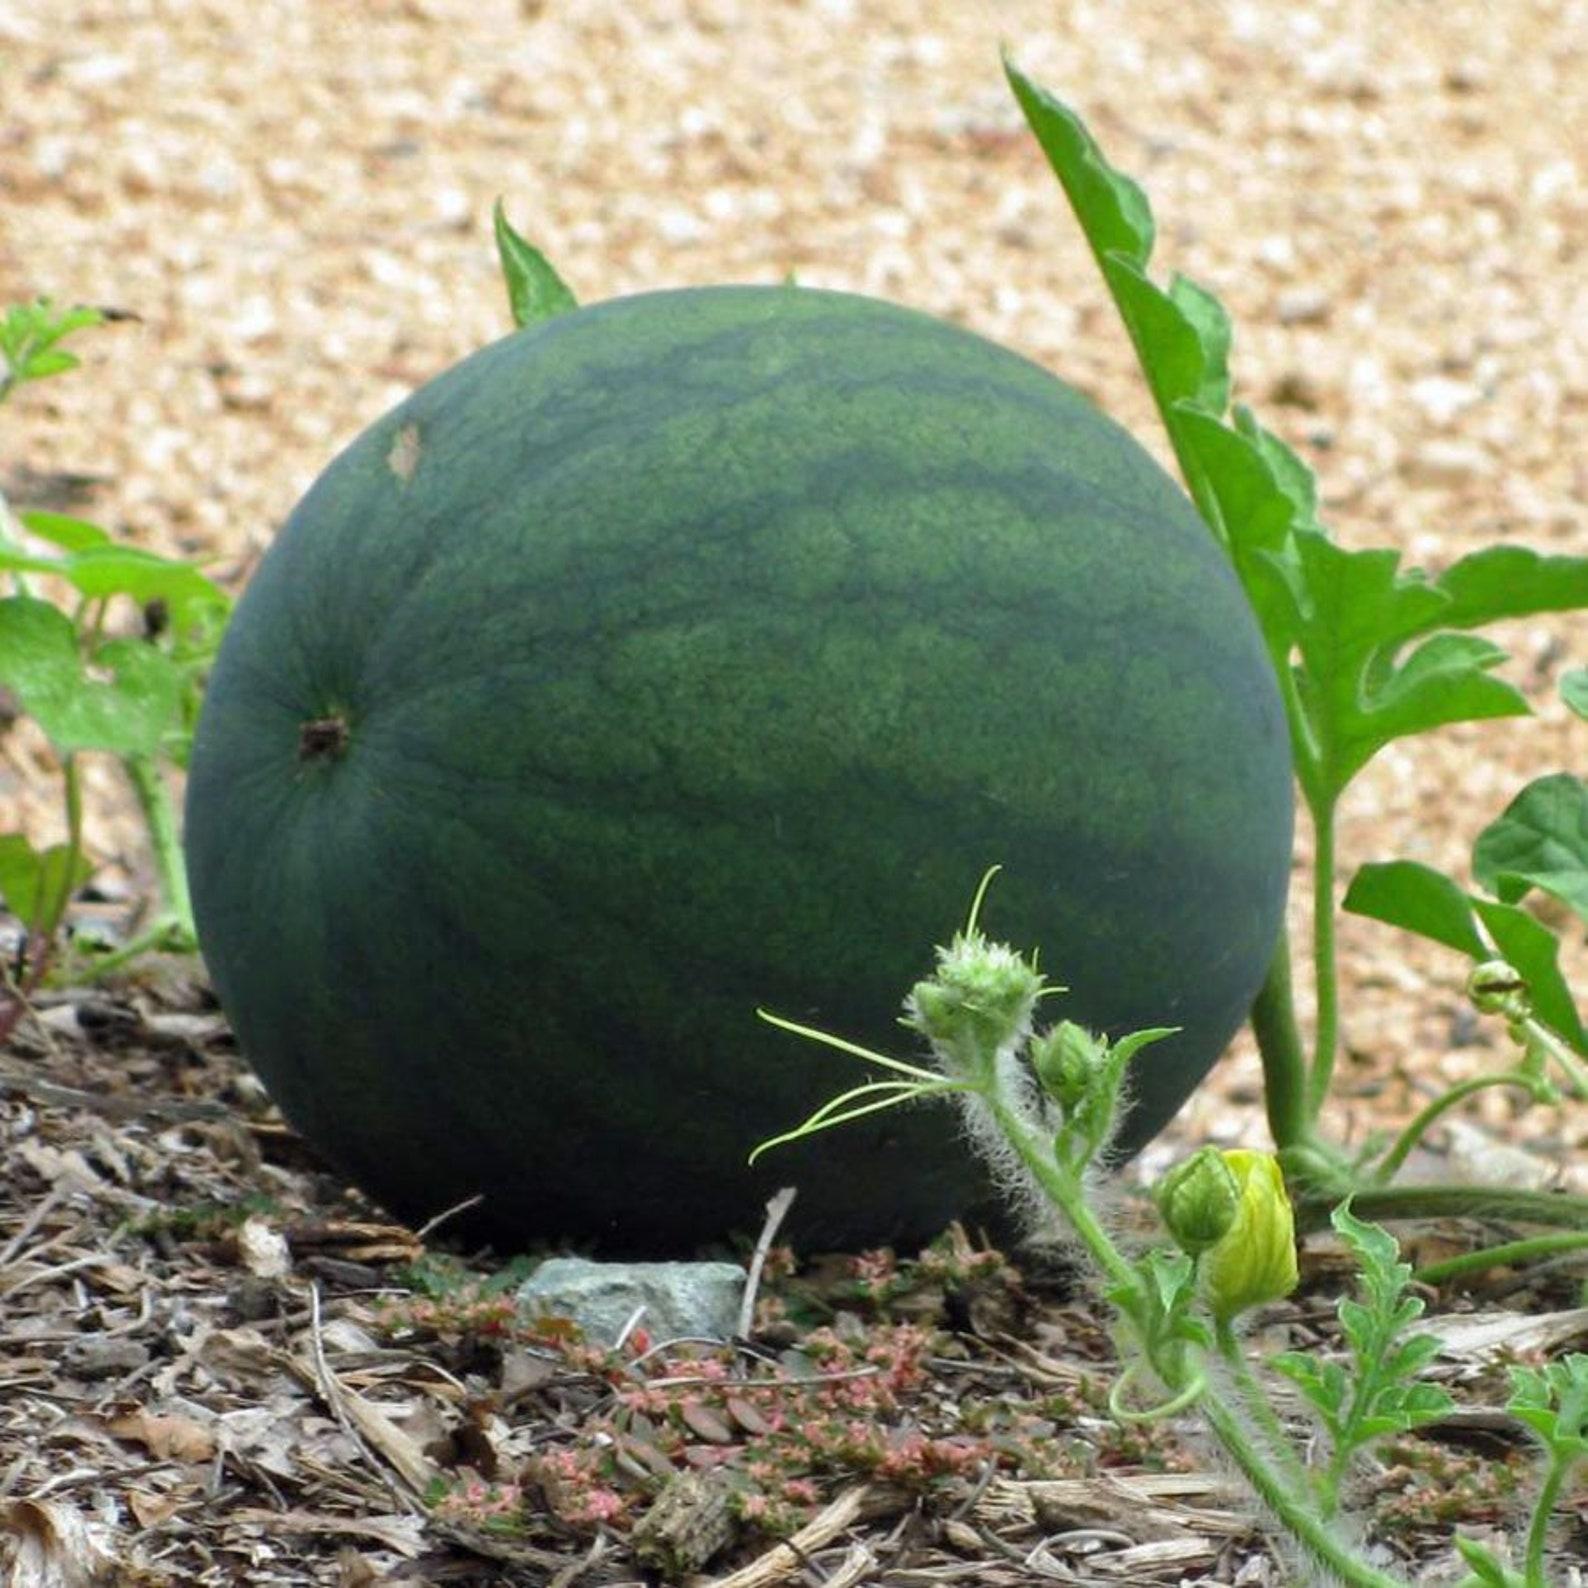 chubby-gray-watermelon-seeds